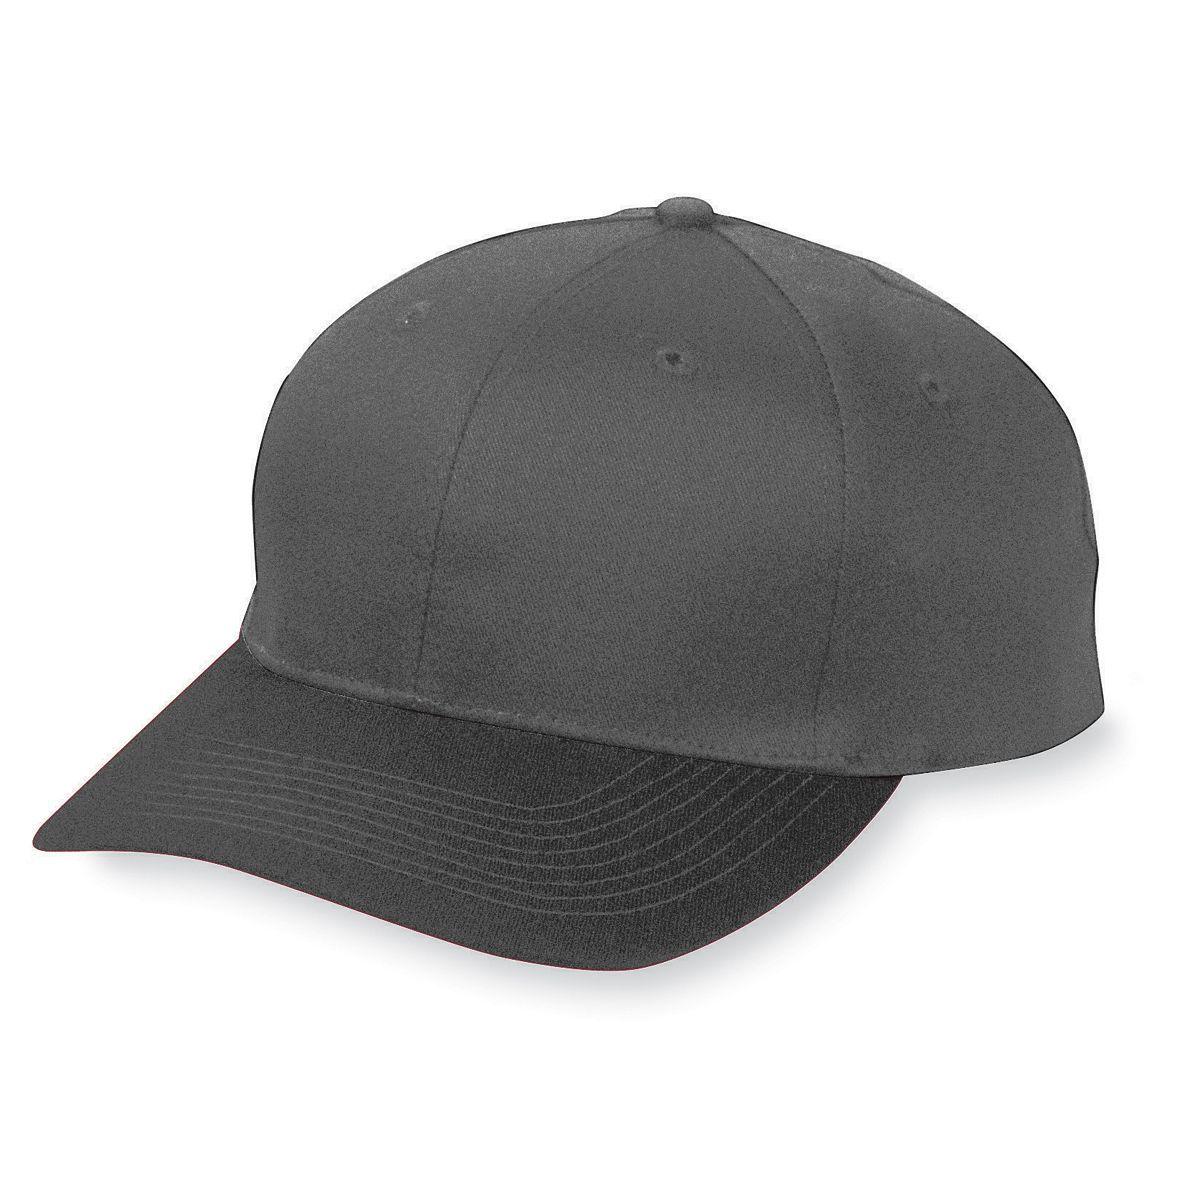 Six-Panel Cotton Twill Low-Profile Cap - BLACK